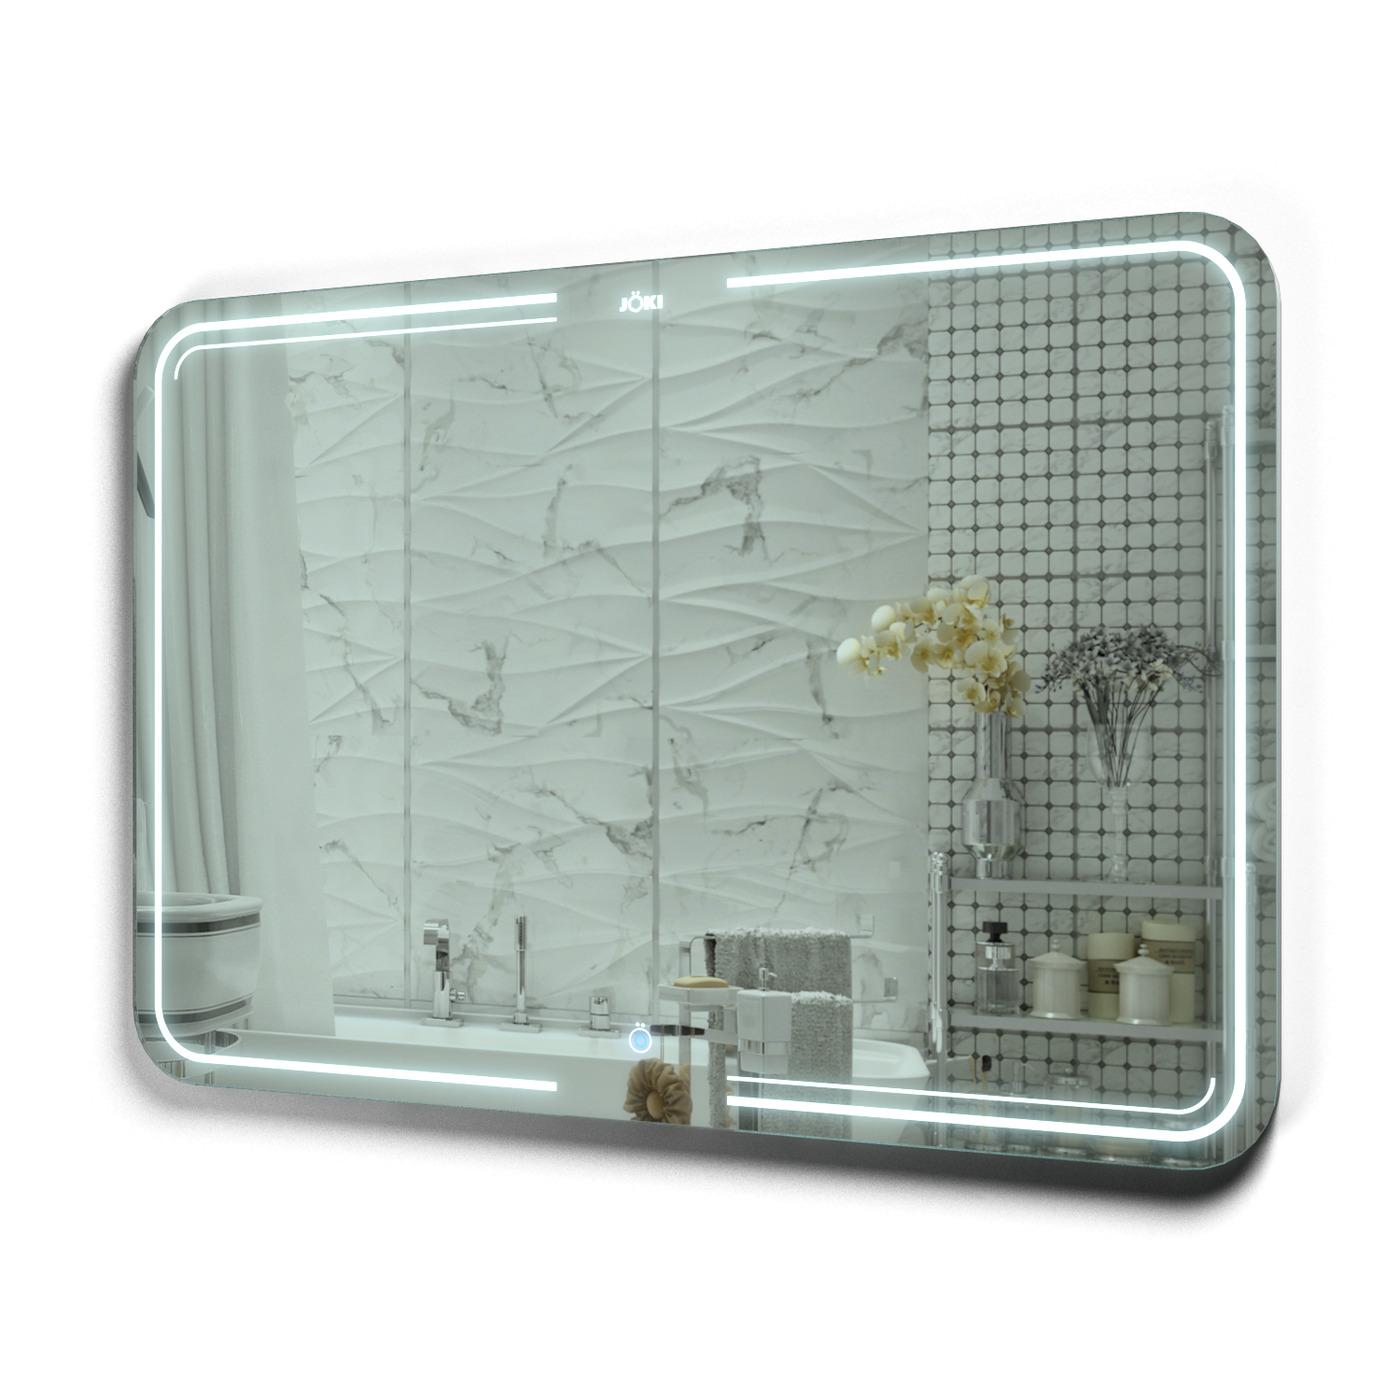 Зеркало интерьерное JOKI, 60 см х 80 см